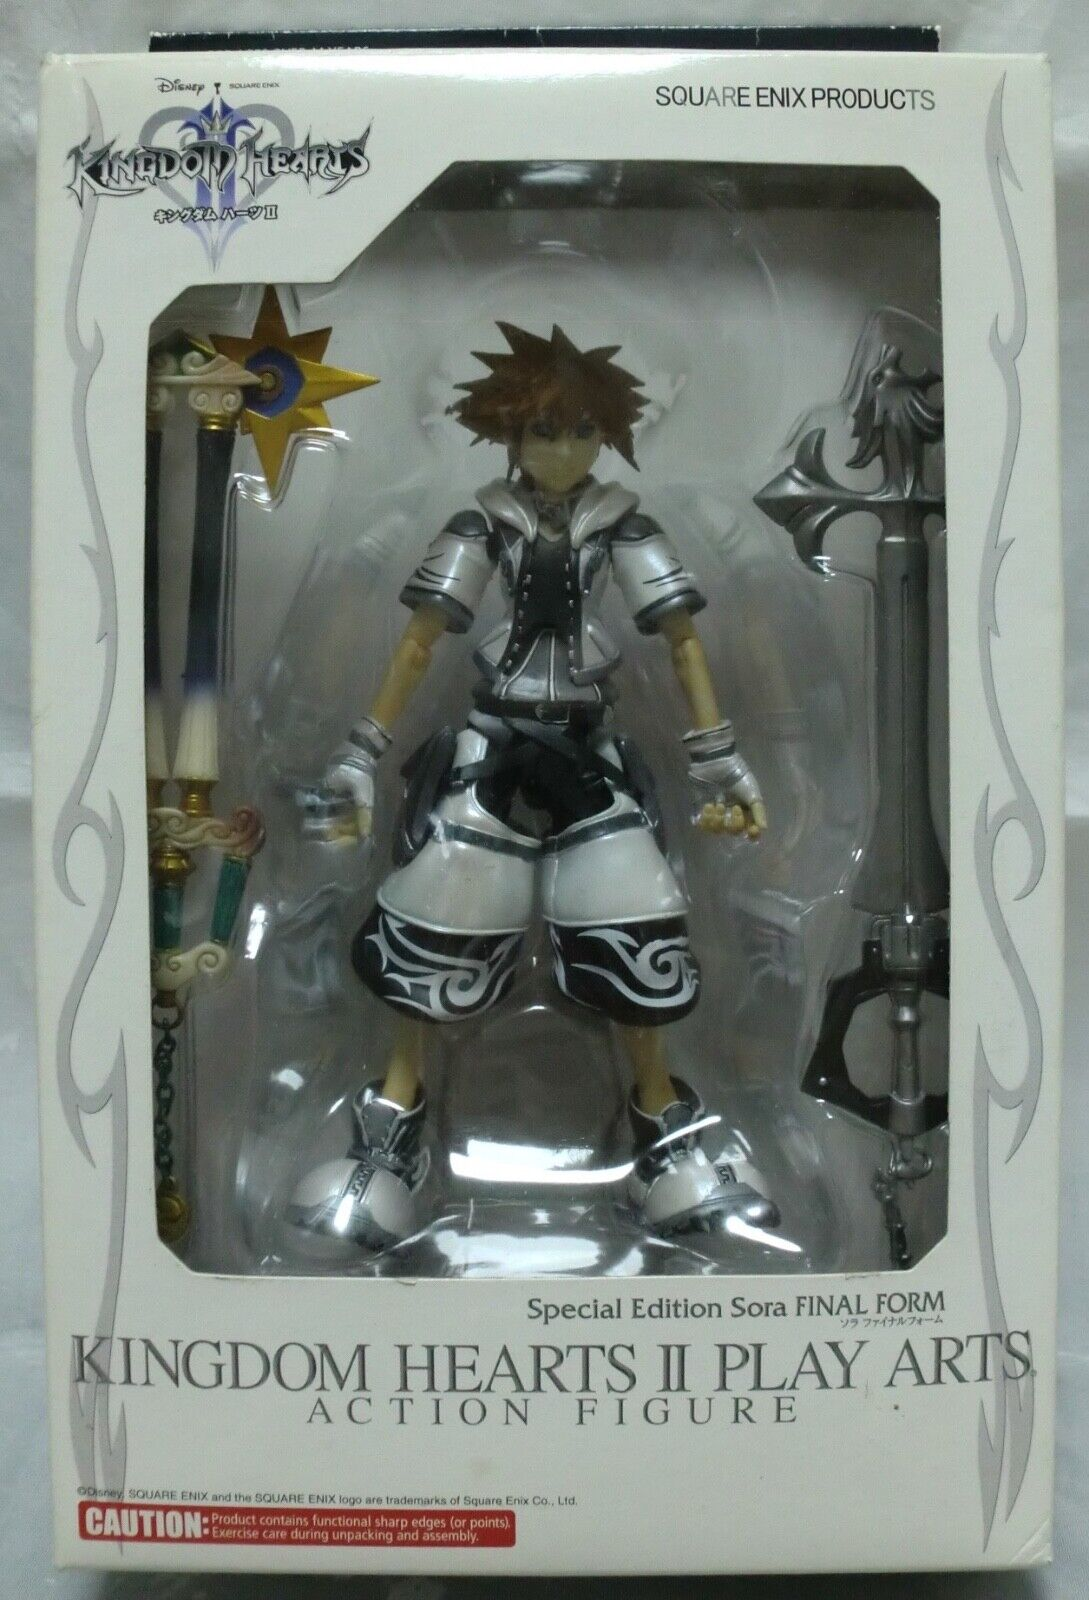 Kingdom Hearts II   Sora Final Form play arts figure  Square-Enix 2006